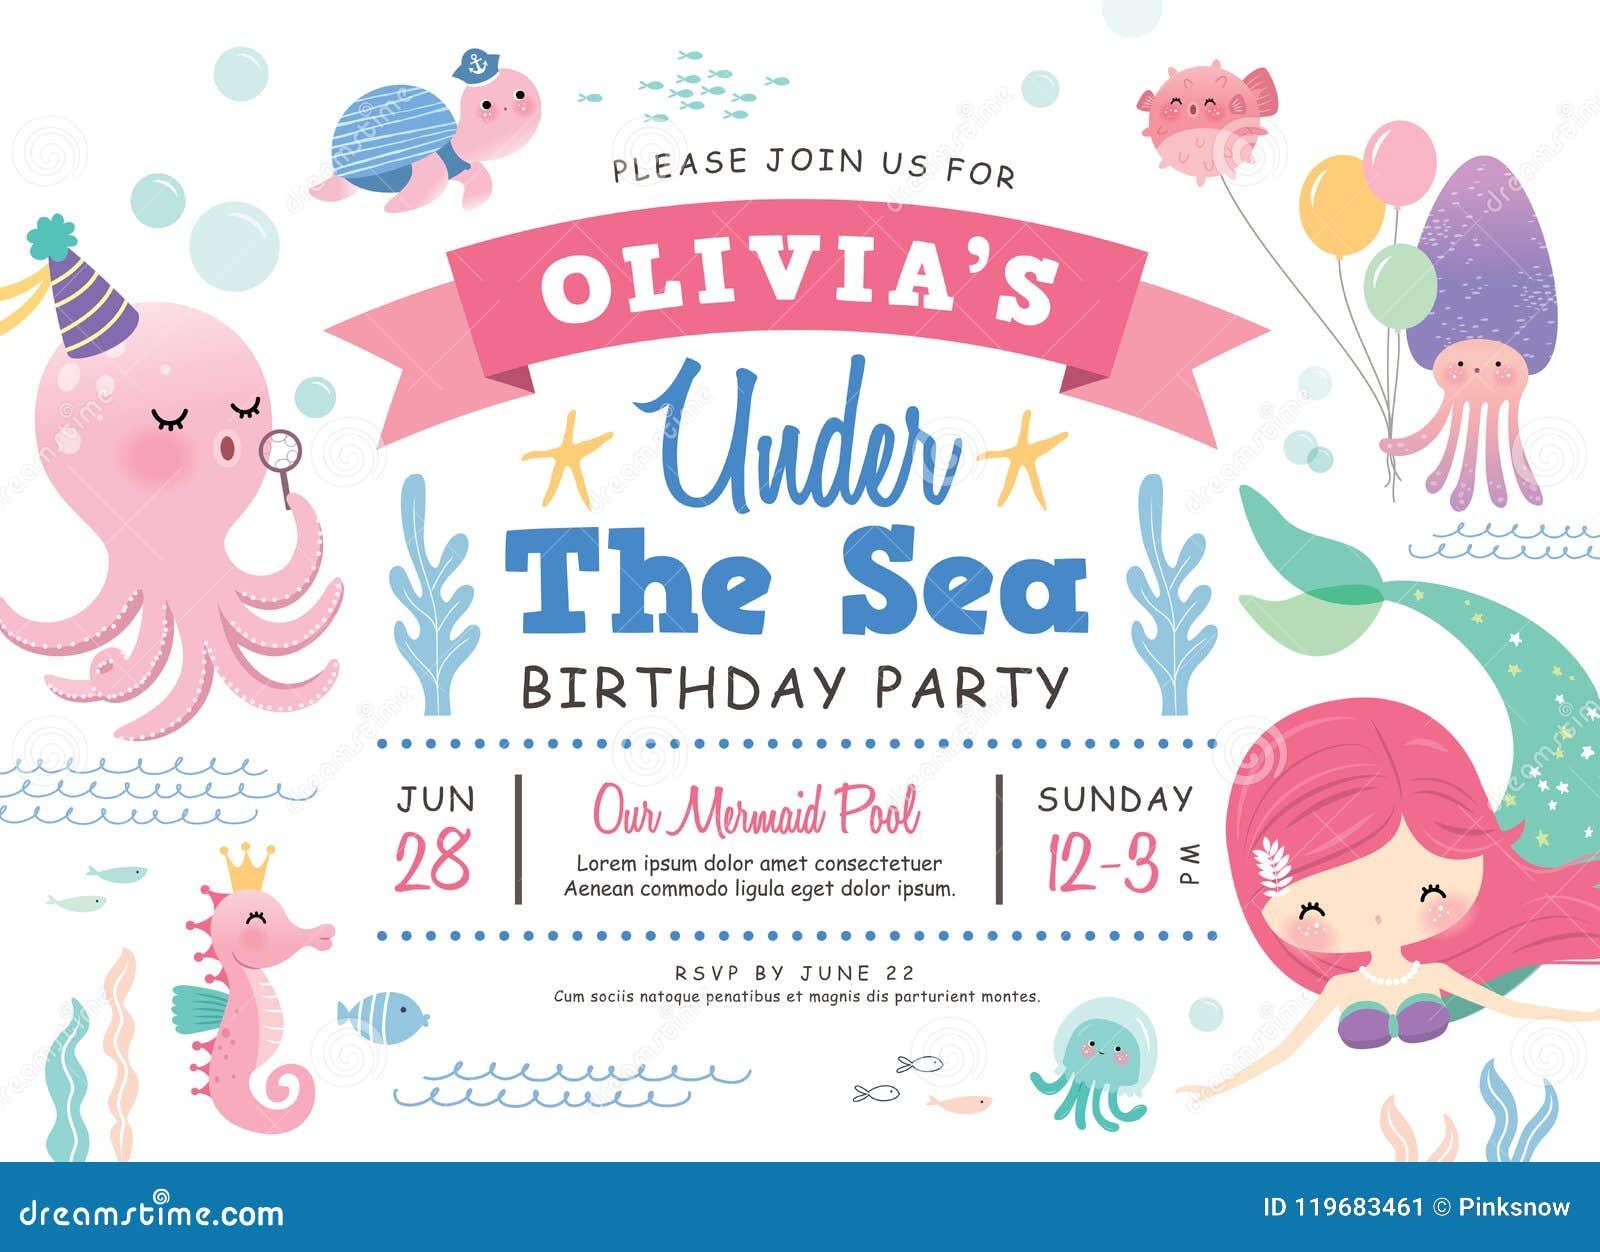 Kids Birthday Party Invitation Card Stock Vector Illustration Of